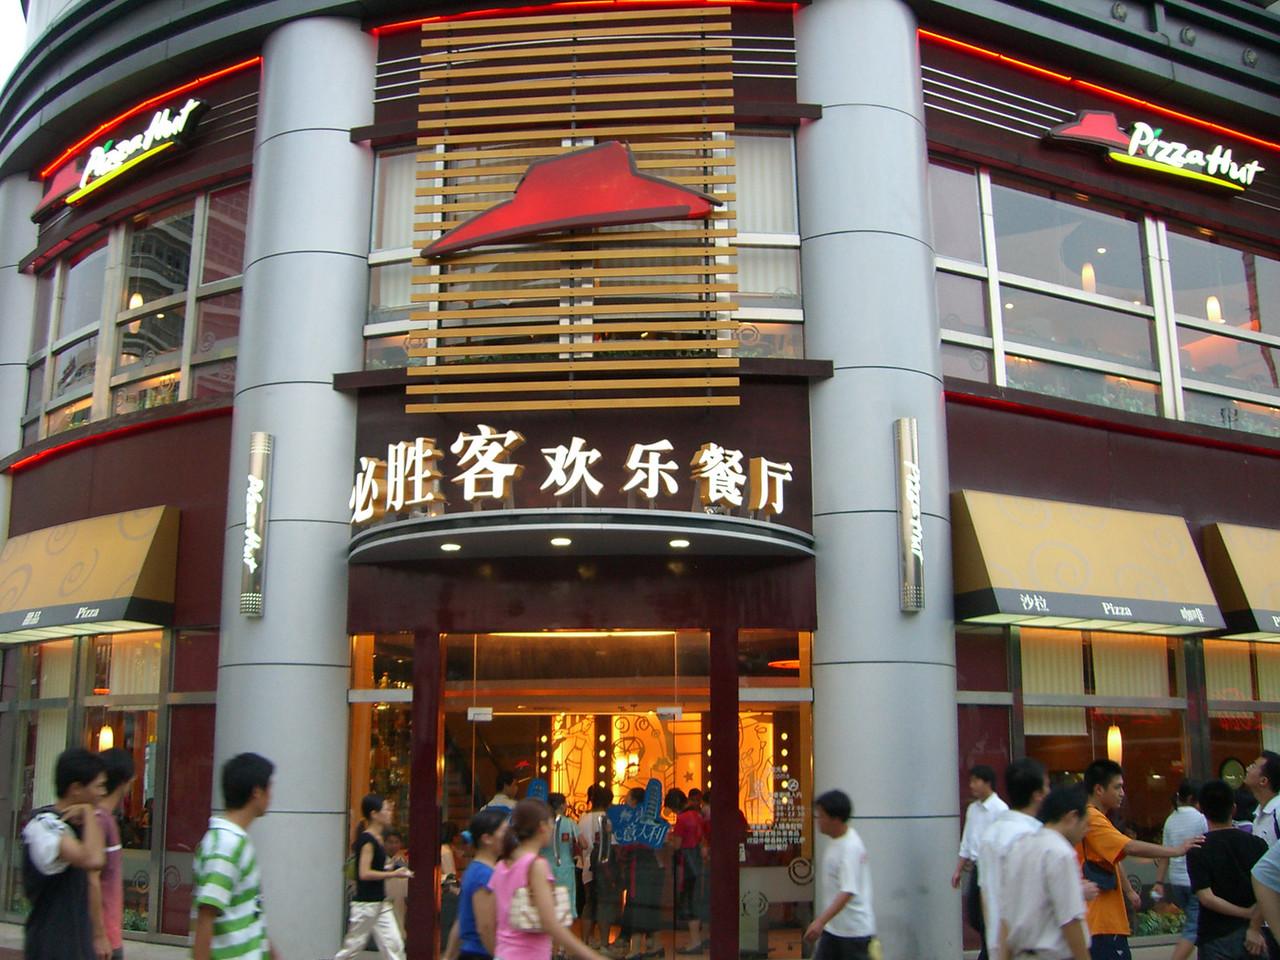 2006 07 14 Fri - China Pizza Hut - gourmet dining